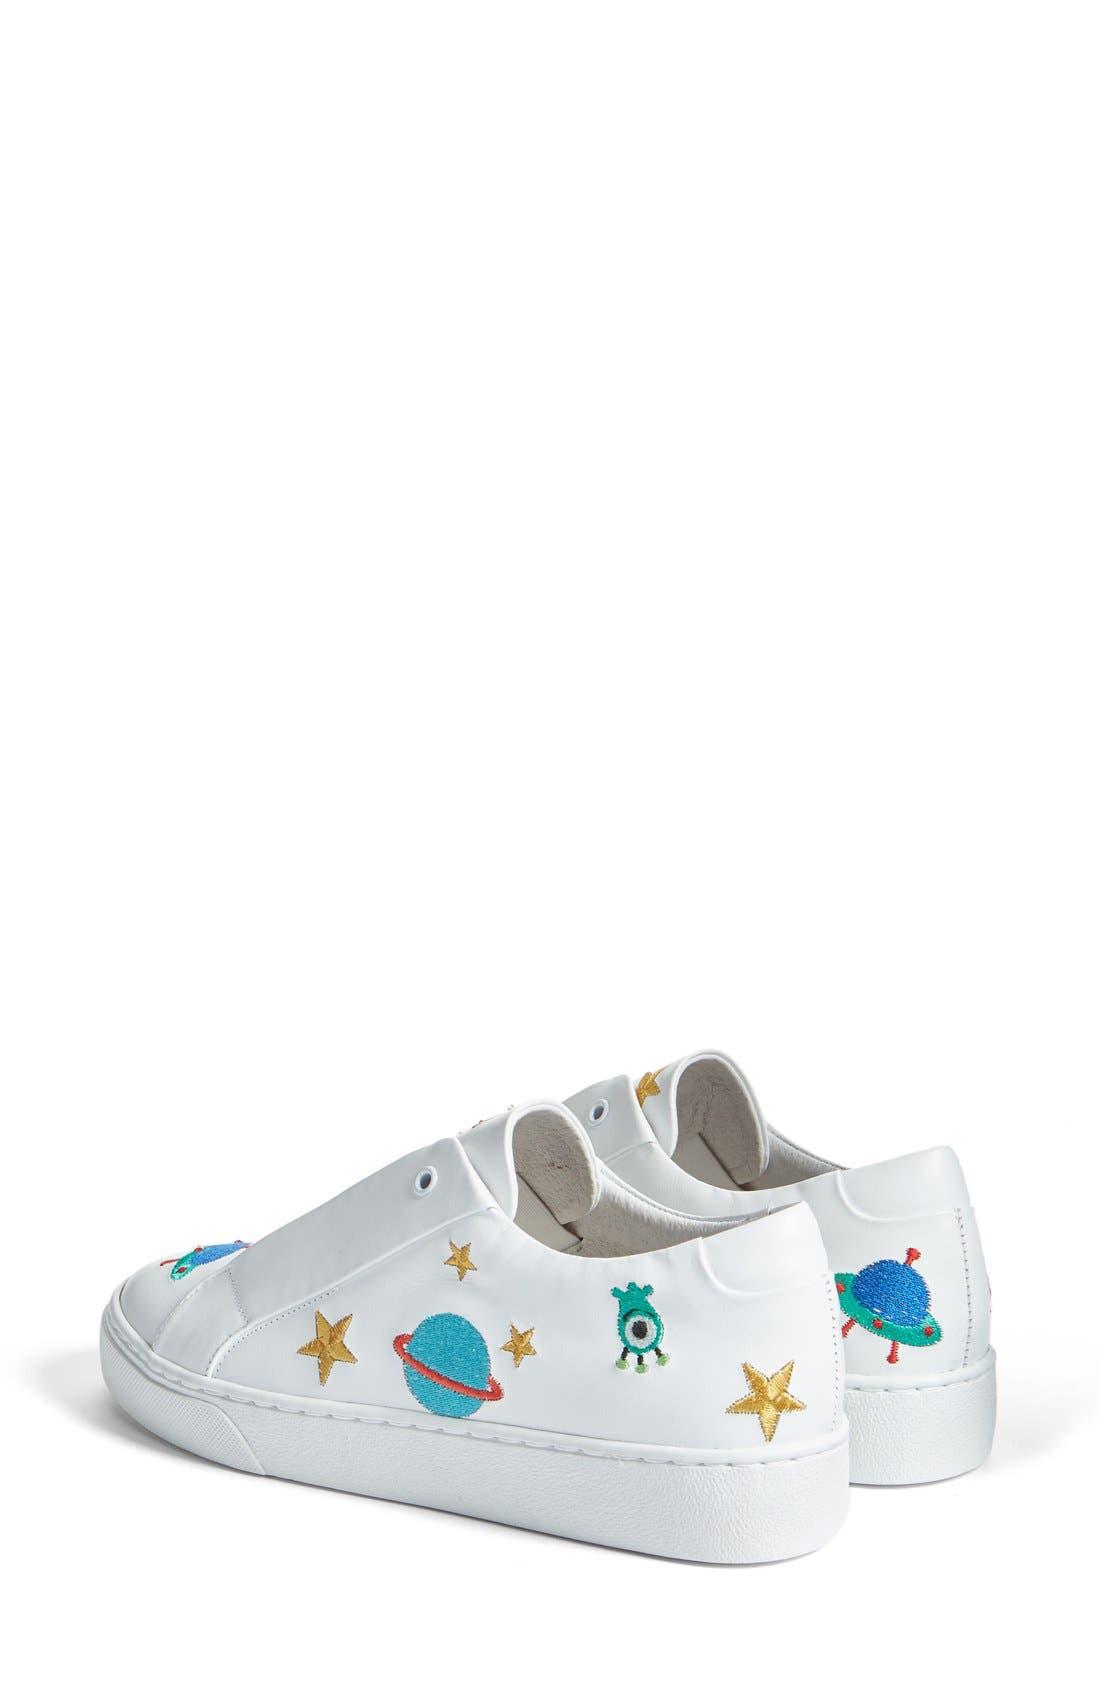 Halley Slip-On Sneaker,                             Alternate thumbnail 2, color,                             White Leather